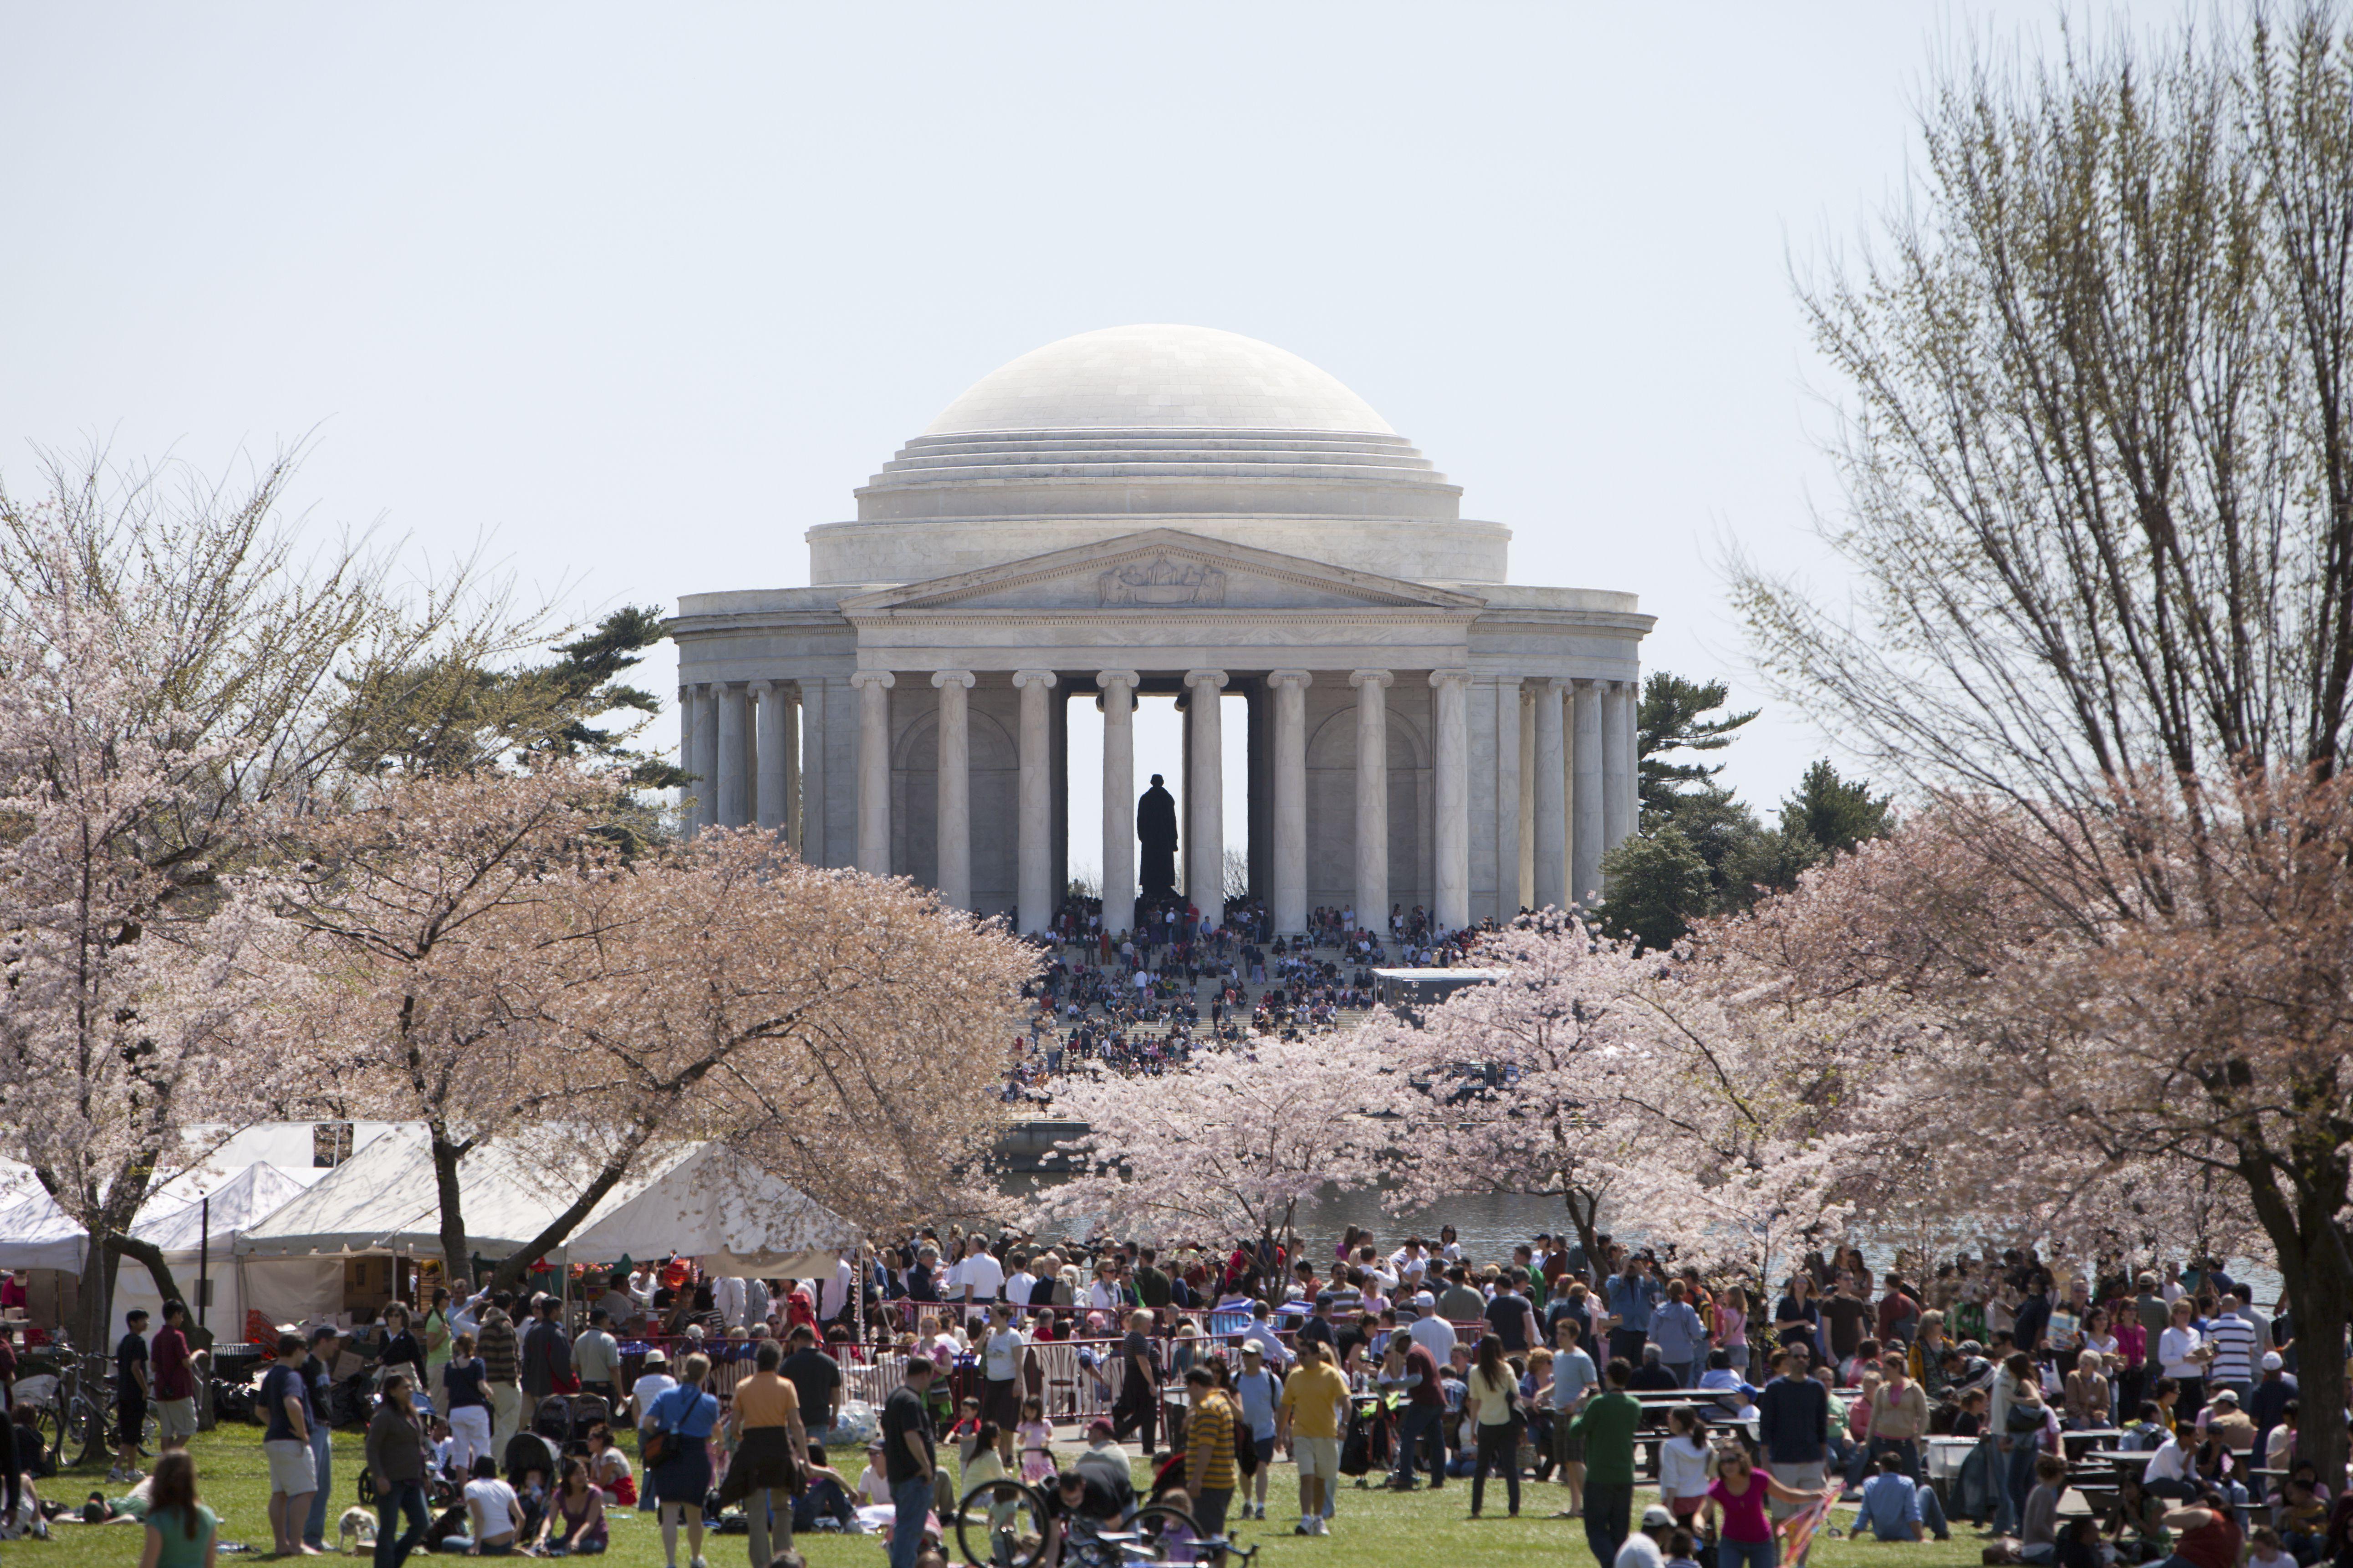 The annual Cherry Blossom Festival at the Jefferson Memorial in Washington, D.C.